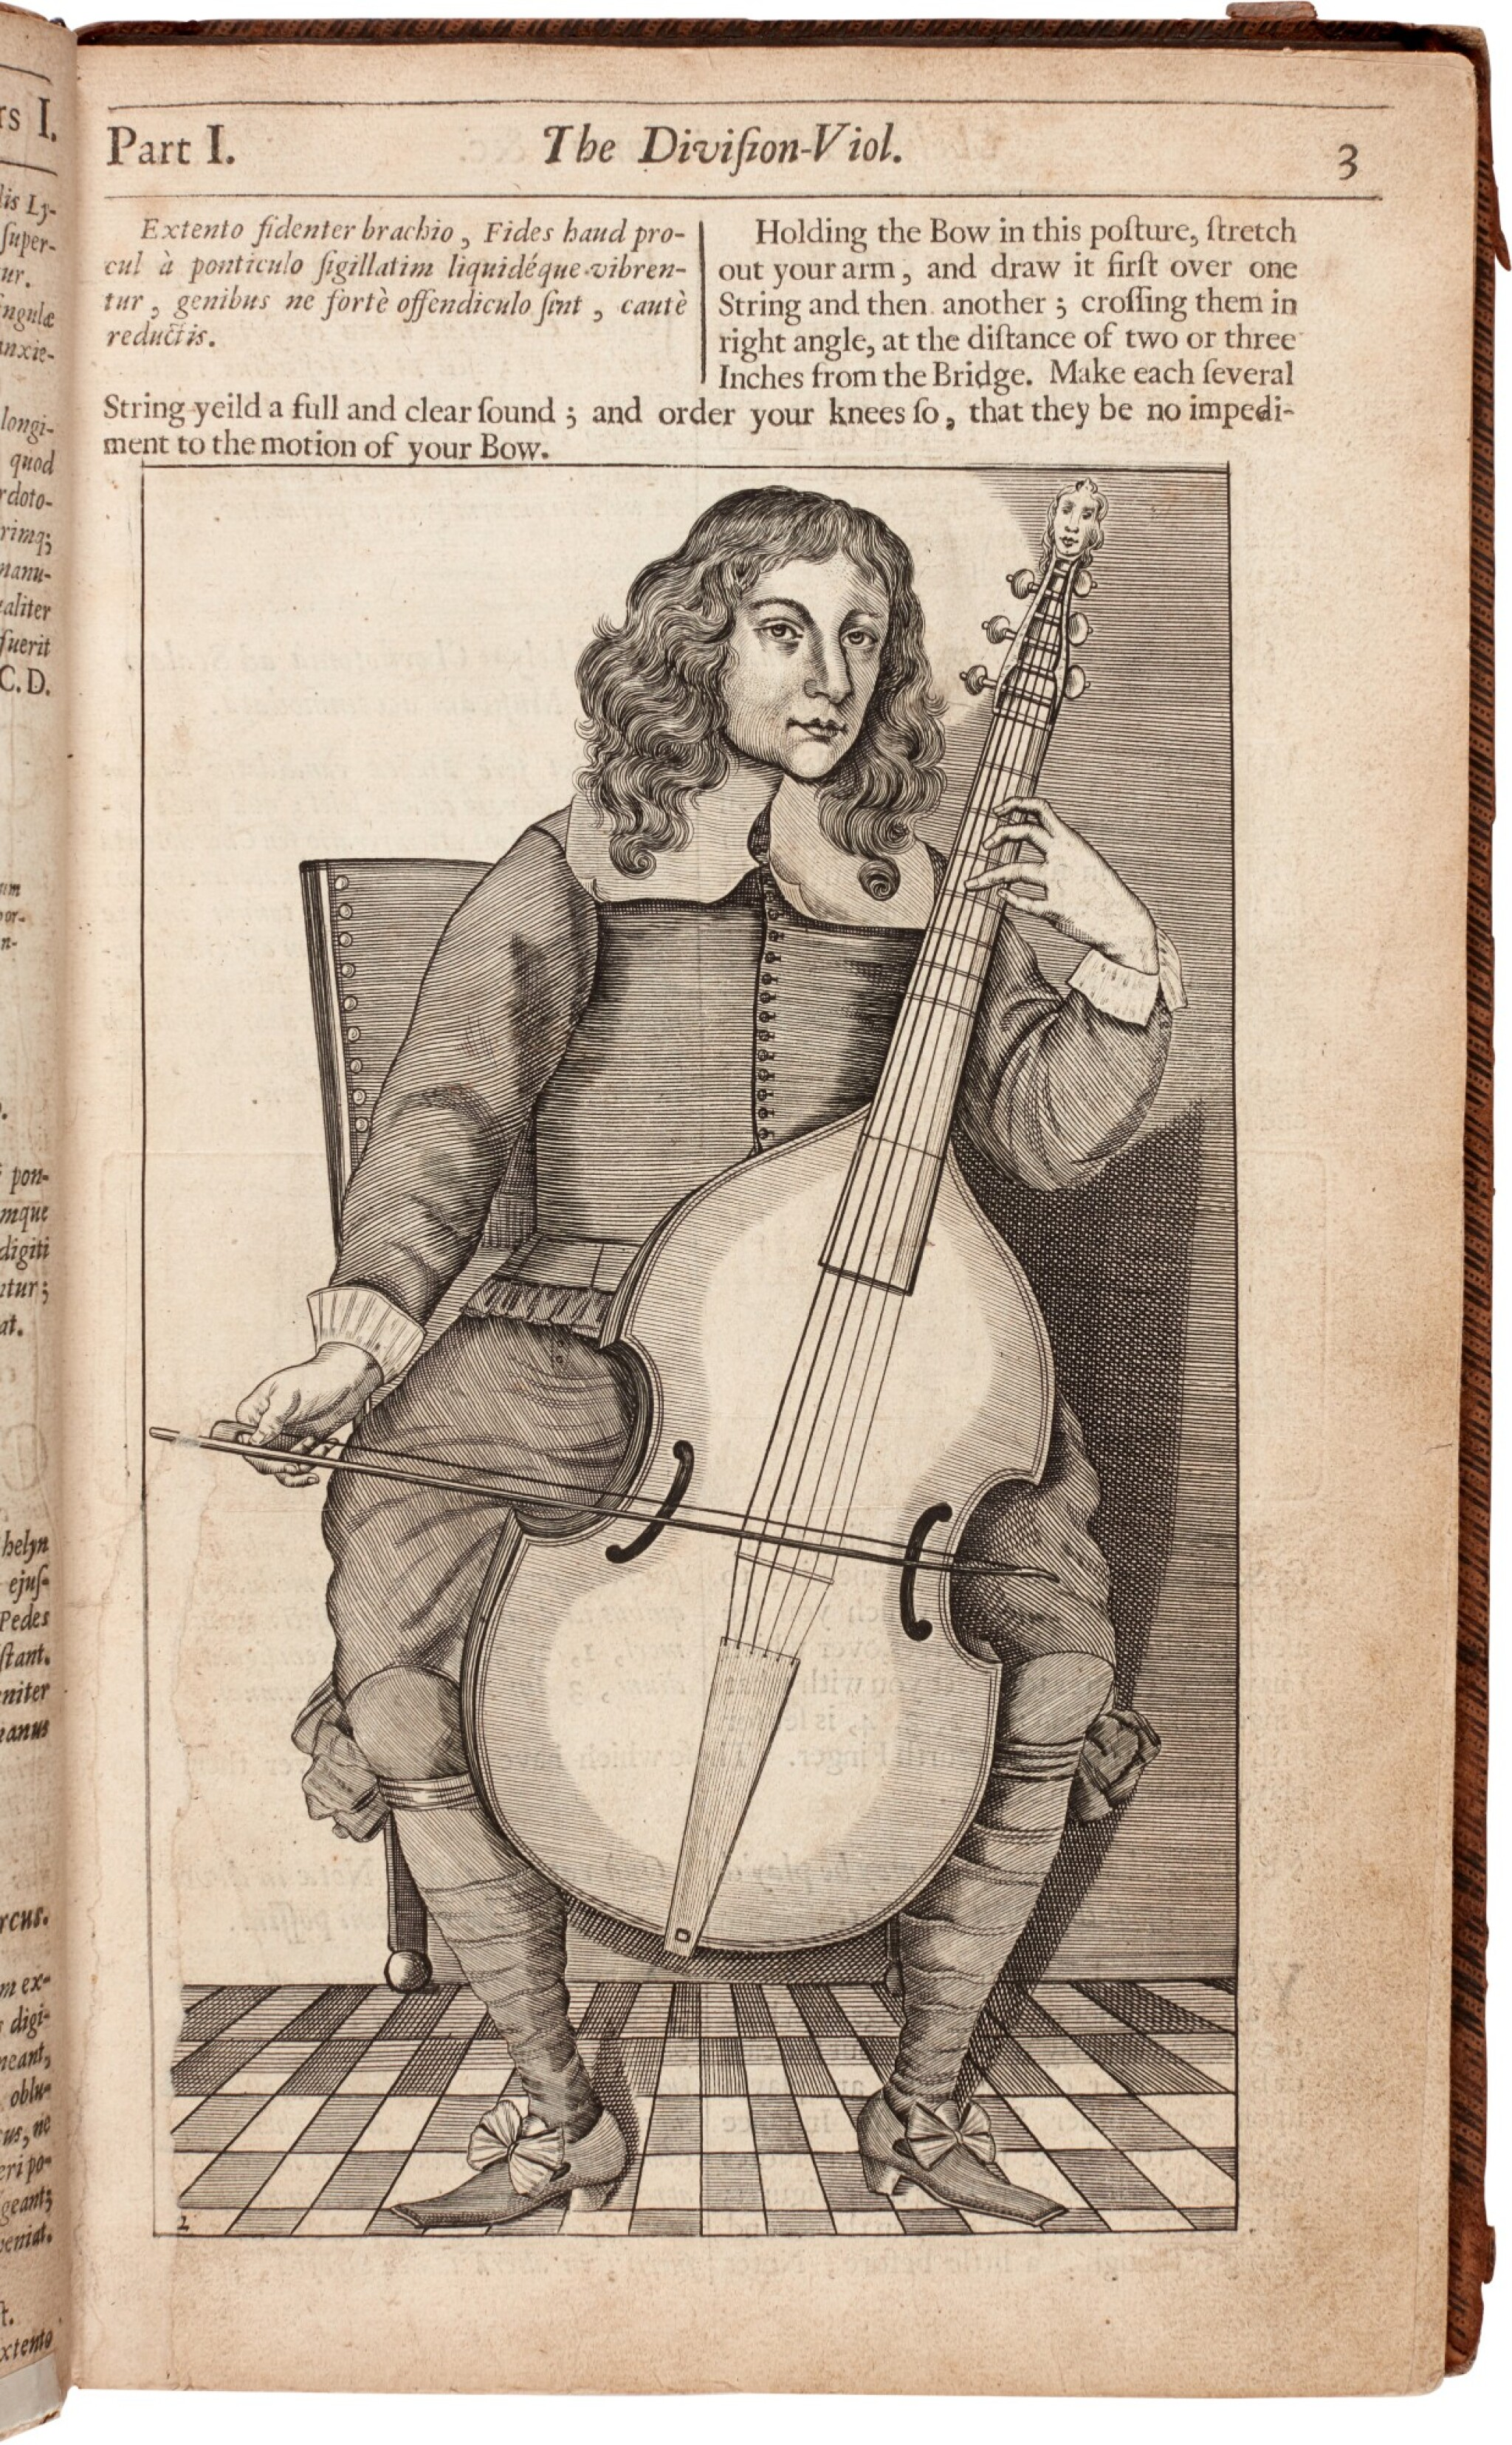 View full screen - View 1 of Lot 112. C. Simpson. Chelys...The Division-Viol, Editio Secunda, 1667.